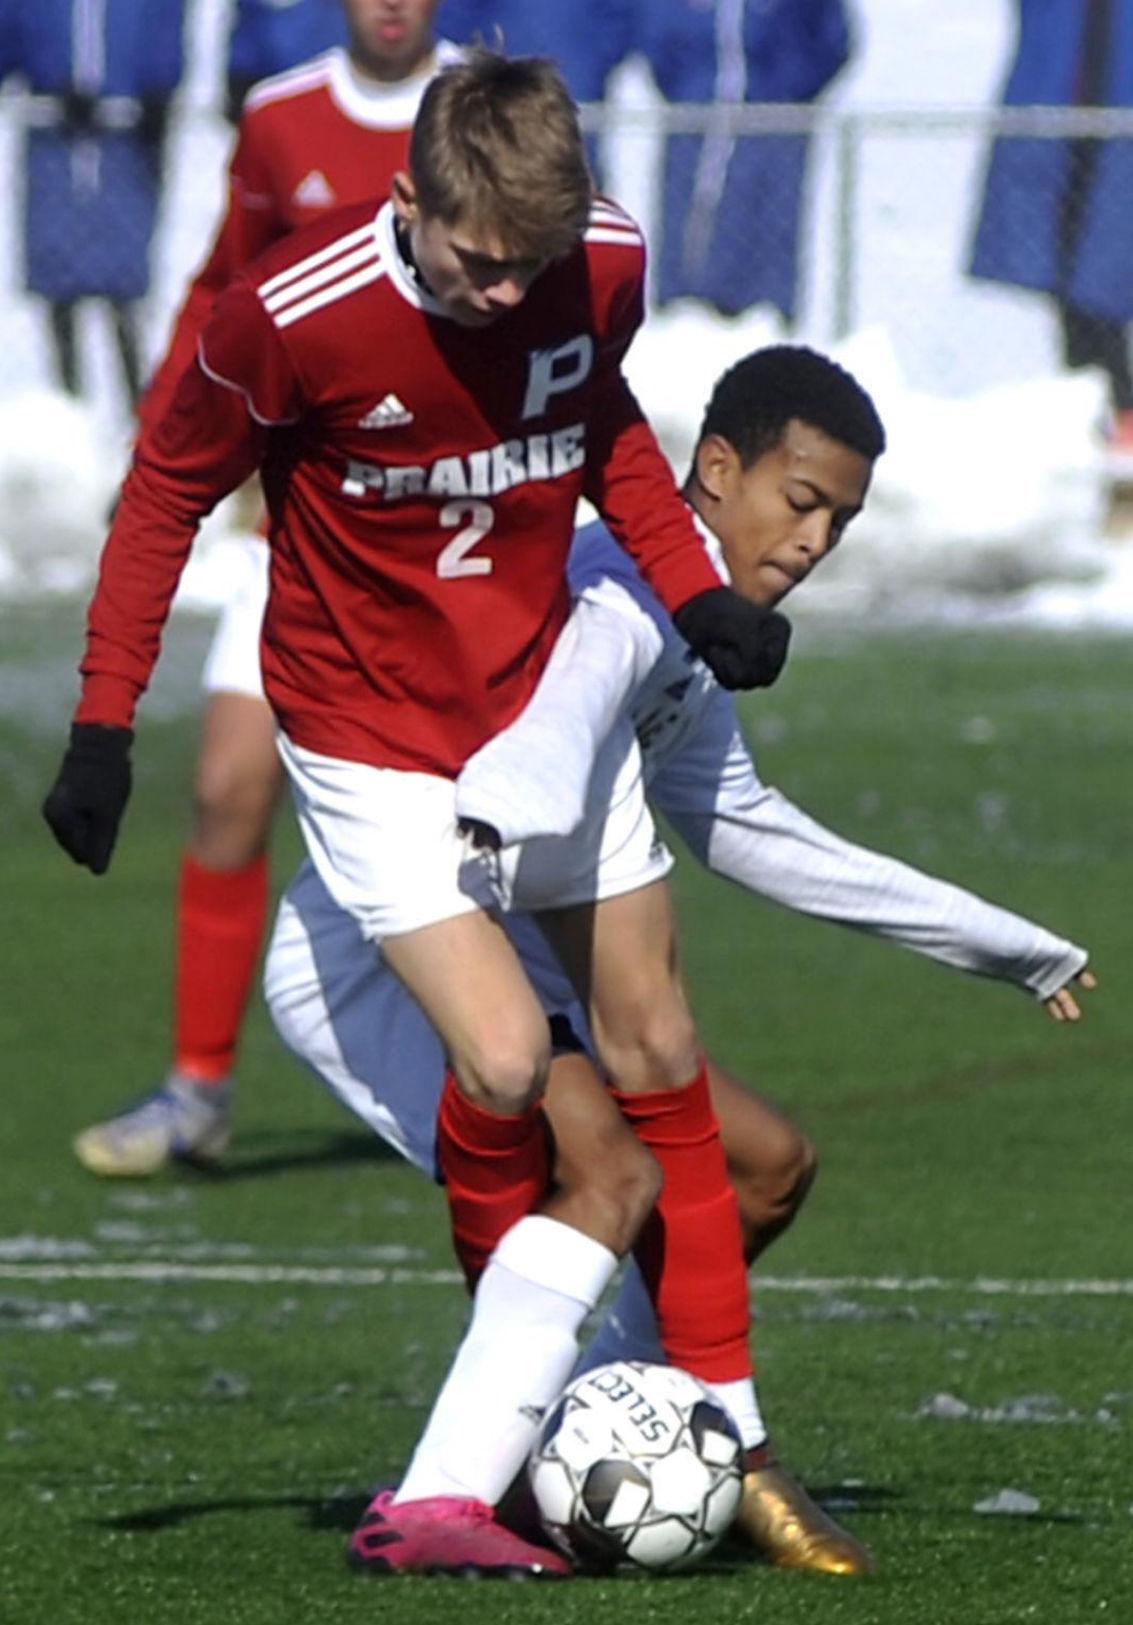 WIAA boys soccer photo: Lake Mills' John Wilke takes on Racine Prairie's Jason Frosch